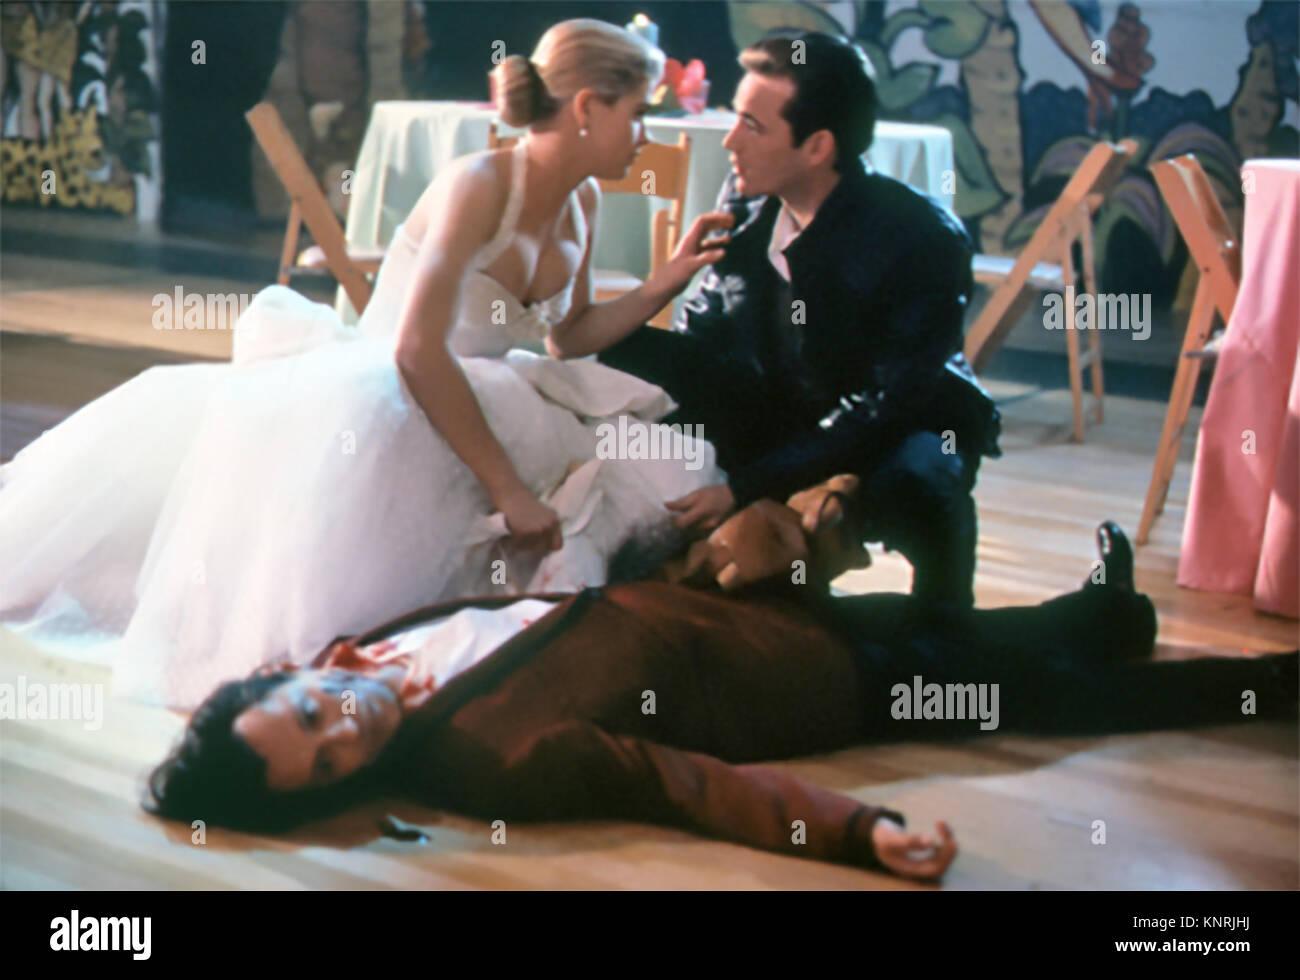 BUFFY THE VAMPIRE SLAYER 1992 Twentieth Century Fox film with Kristy Swanson and Luke Perry - Stock Image